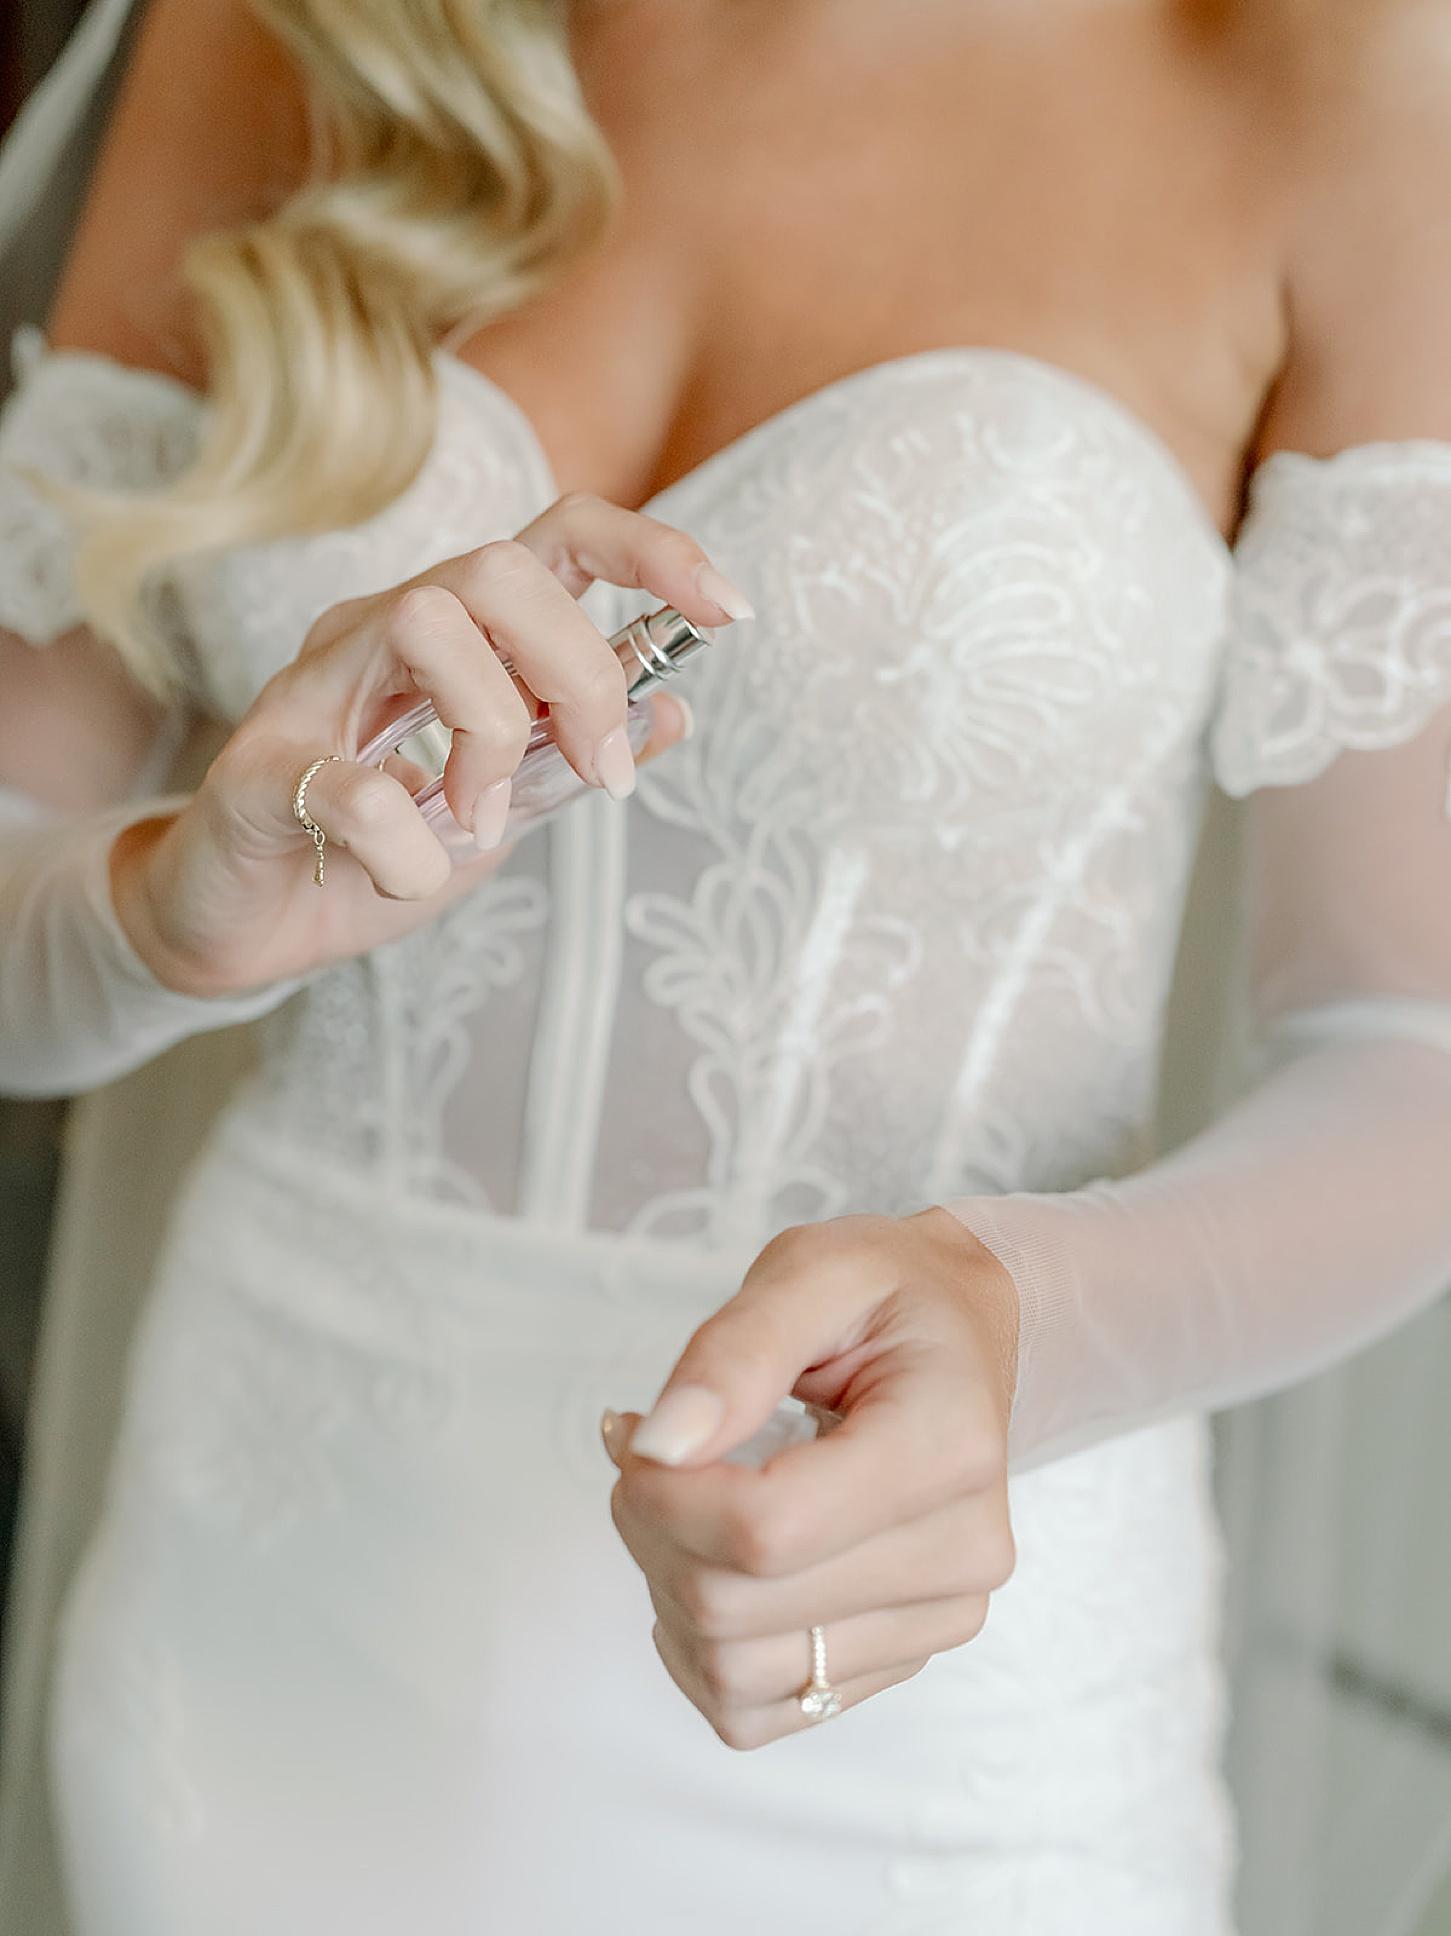 Atlantic City Wedding Photography Studio by Magdalena Studios Lexy Cha 0016